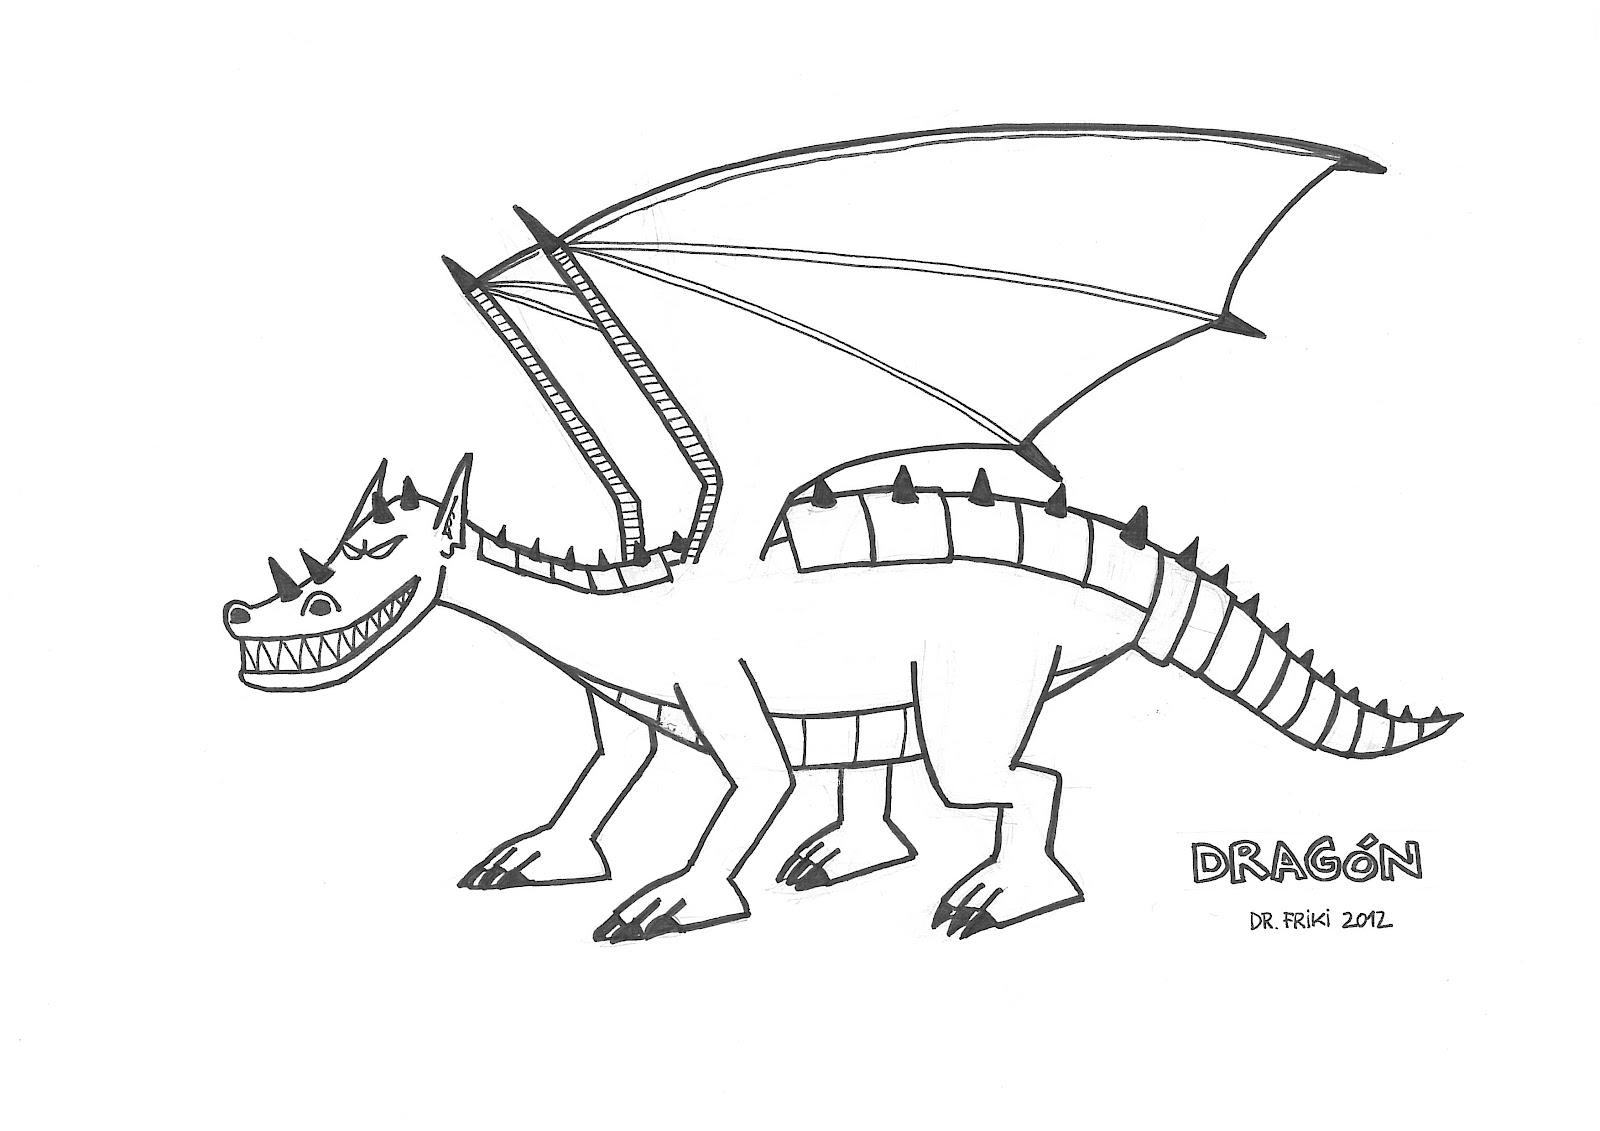 Dragones Feroces Para Colorear: Drfrikicomics: Febrero 2012